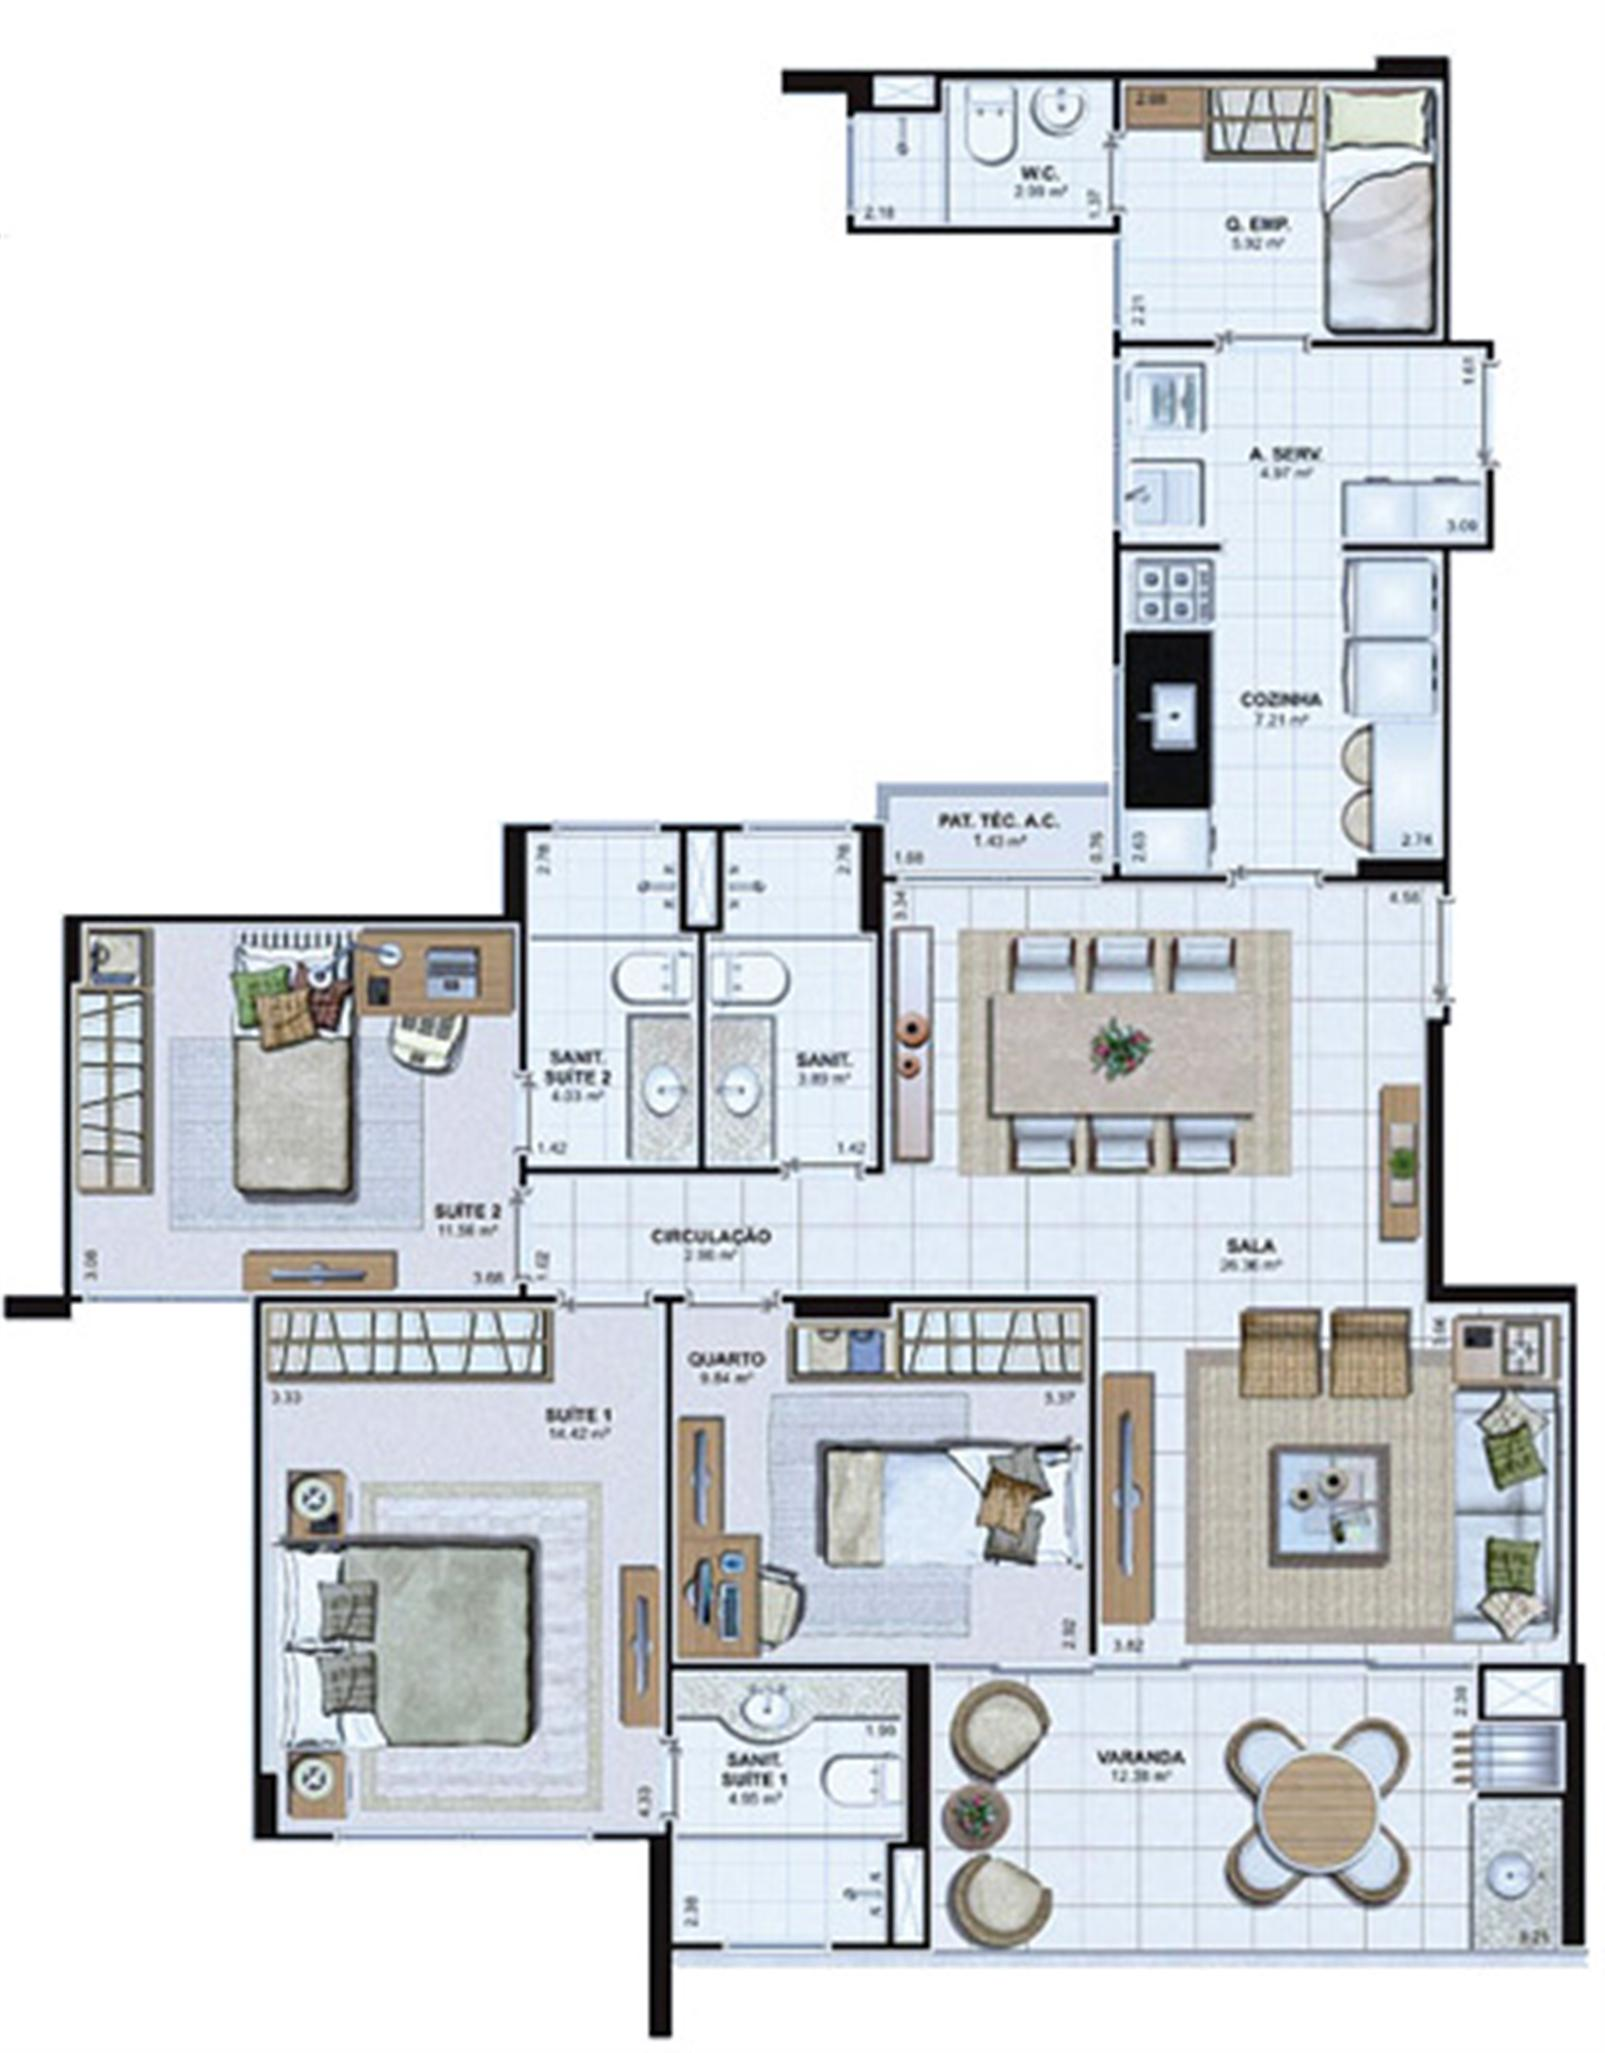 Planta Tipo 112,91 m² | Le Parc Salvador – Apartamentona  Av. Paralela - Salvador - Bahia